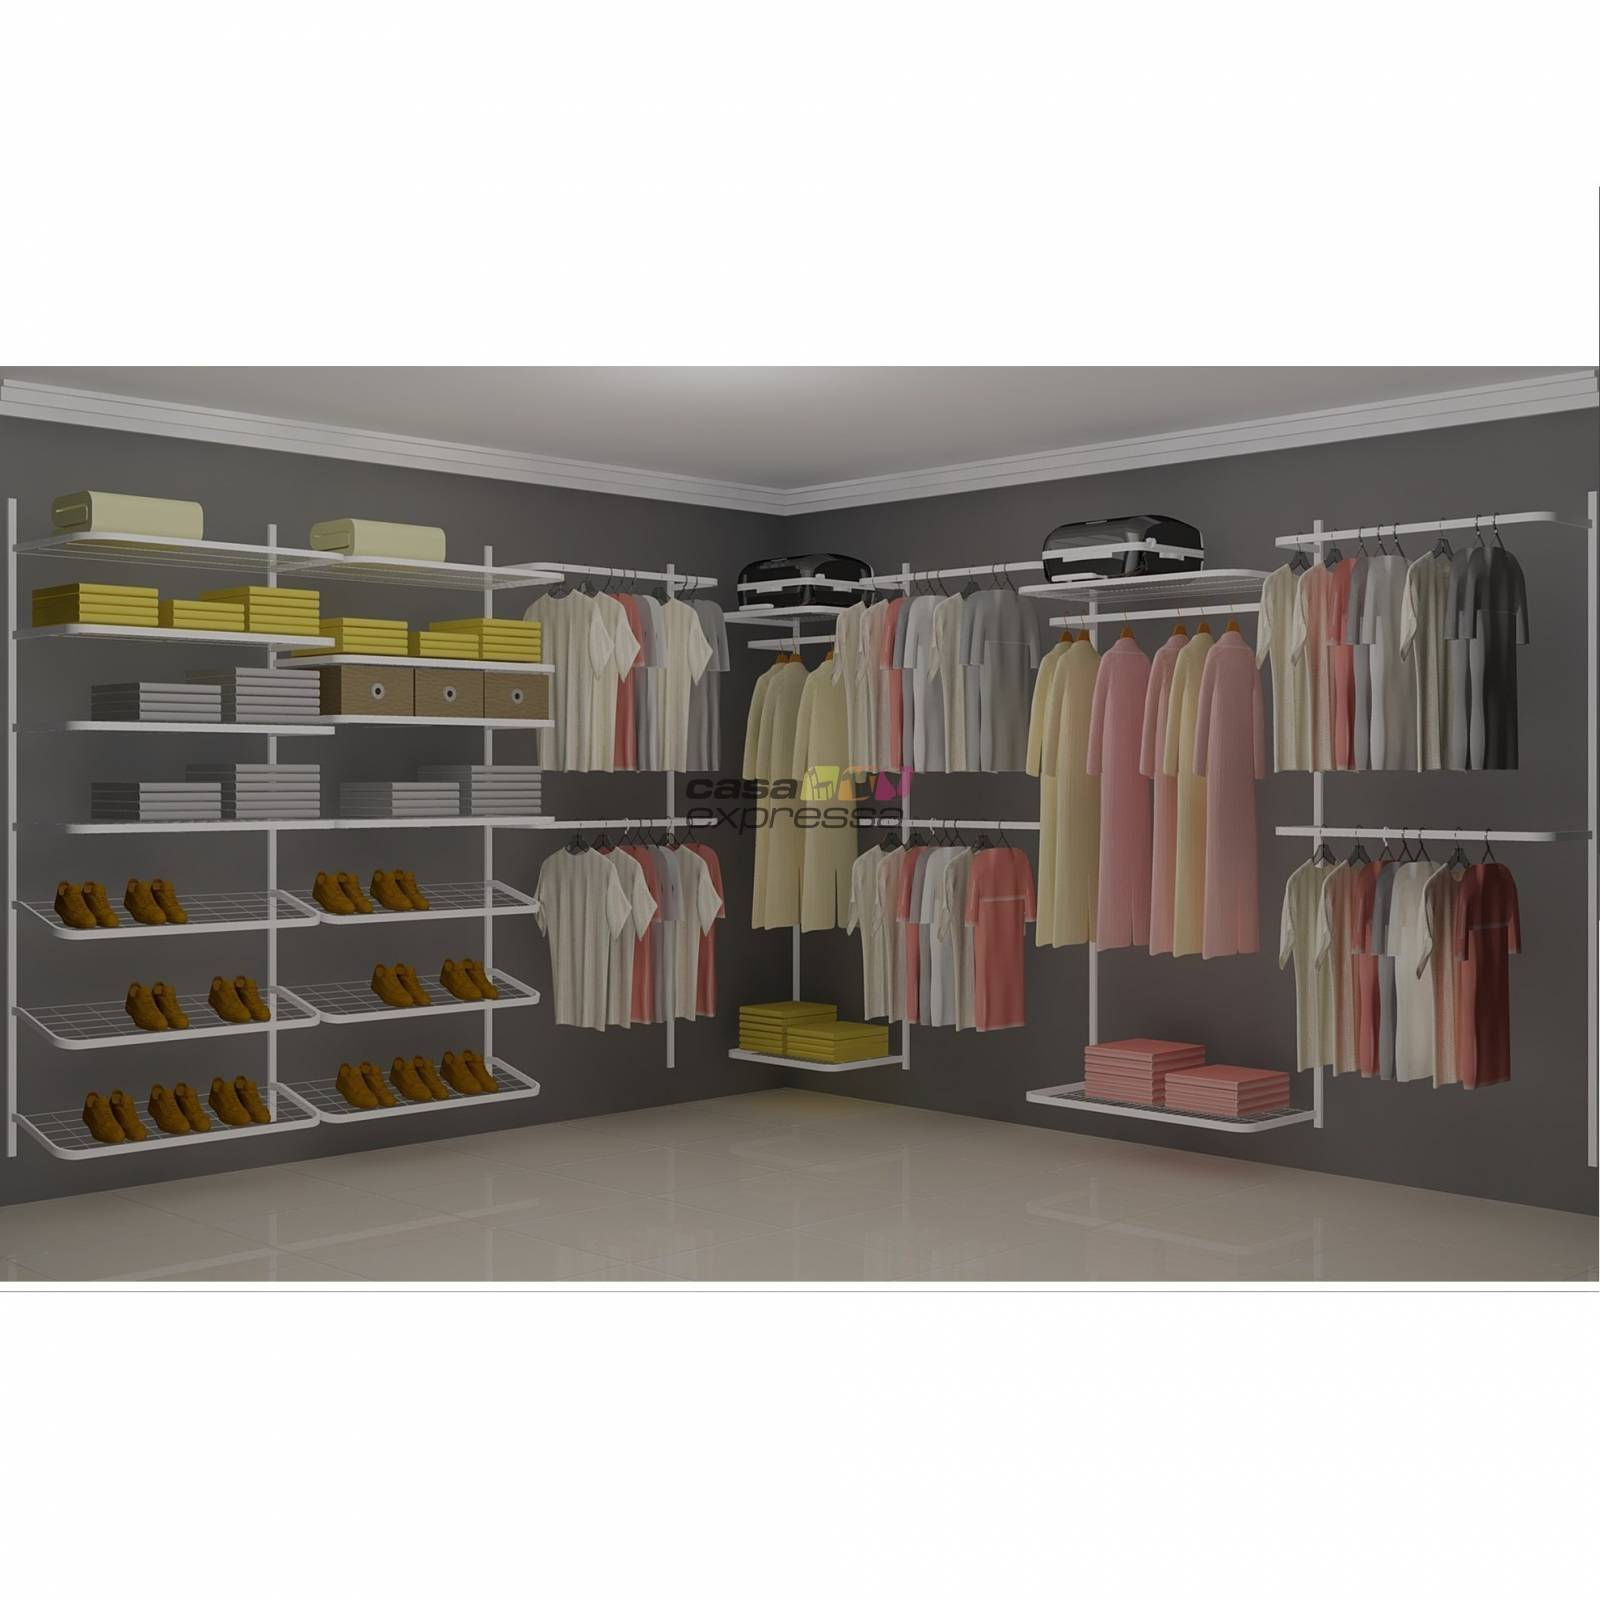 Closet Aramado em L  CLN08 - 3,40 x 3,40m - CASA EXPRESSA